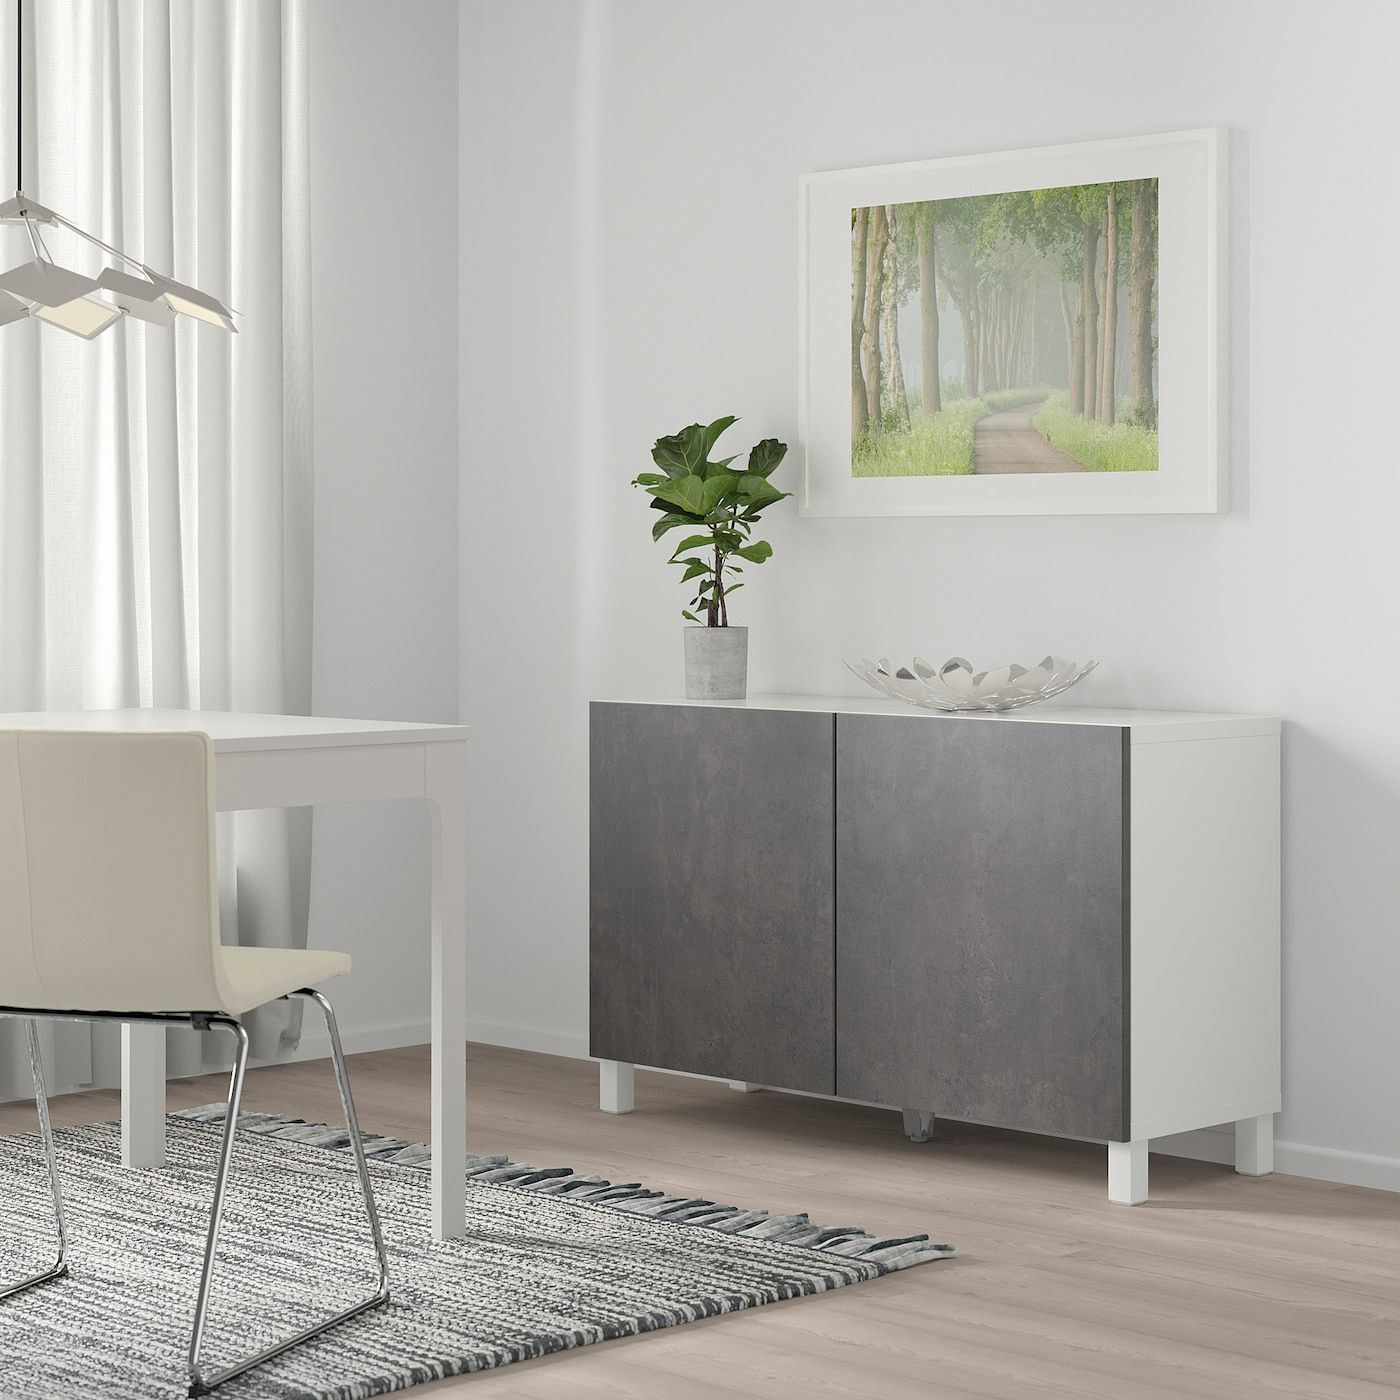 IKEA BESTÅ Storage combination with doors white